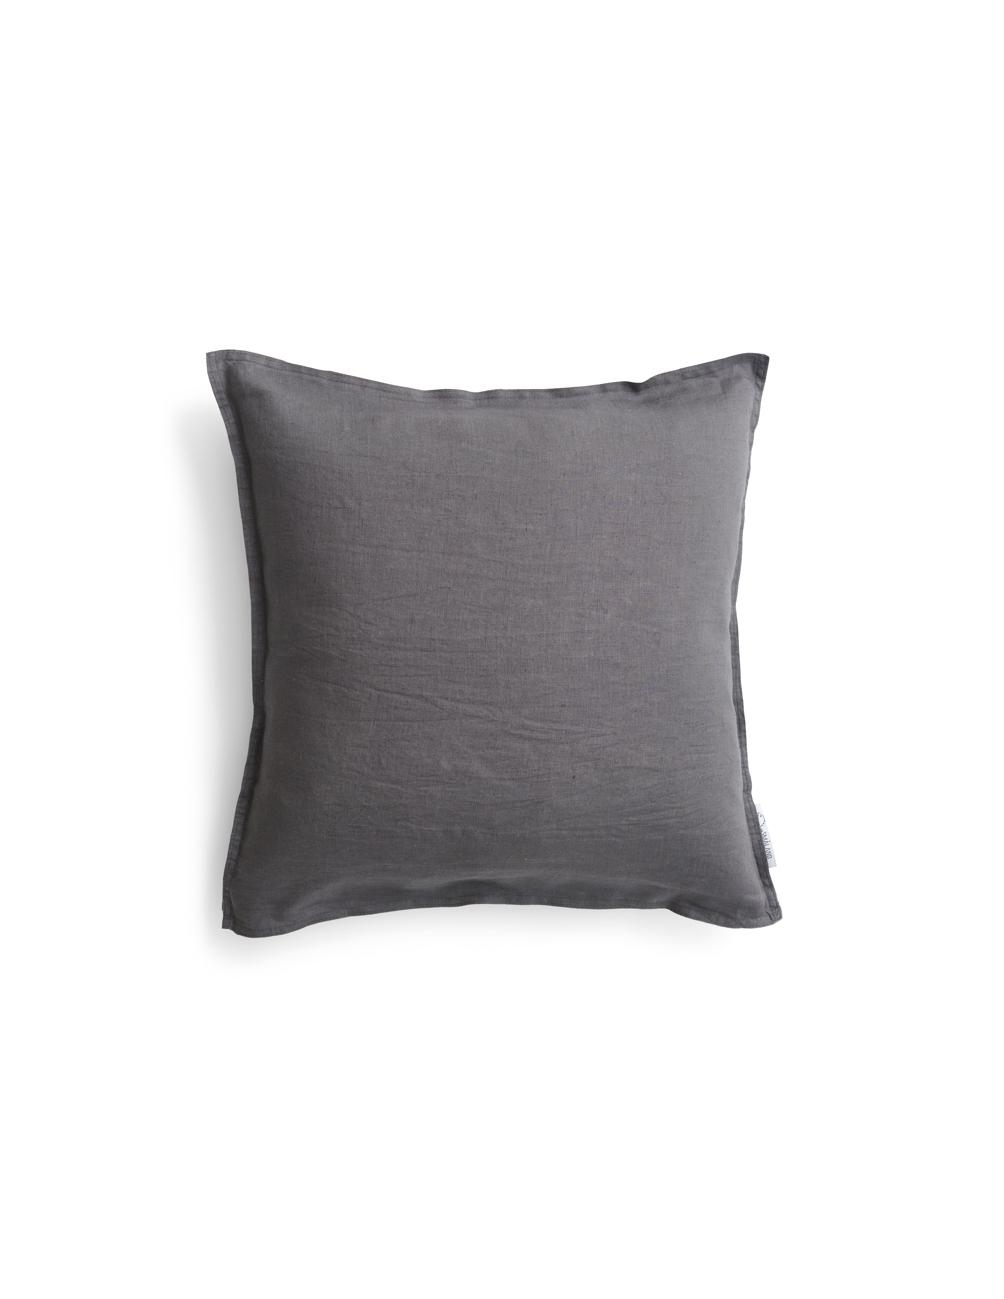 Cushion Cover Linen Dark Grey